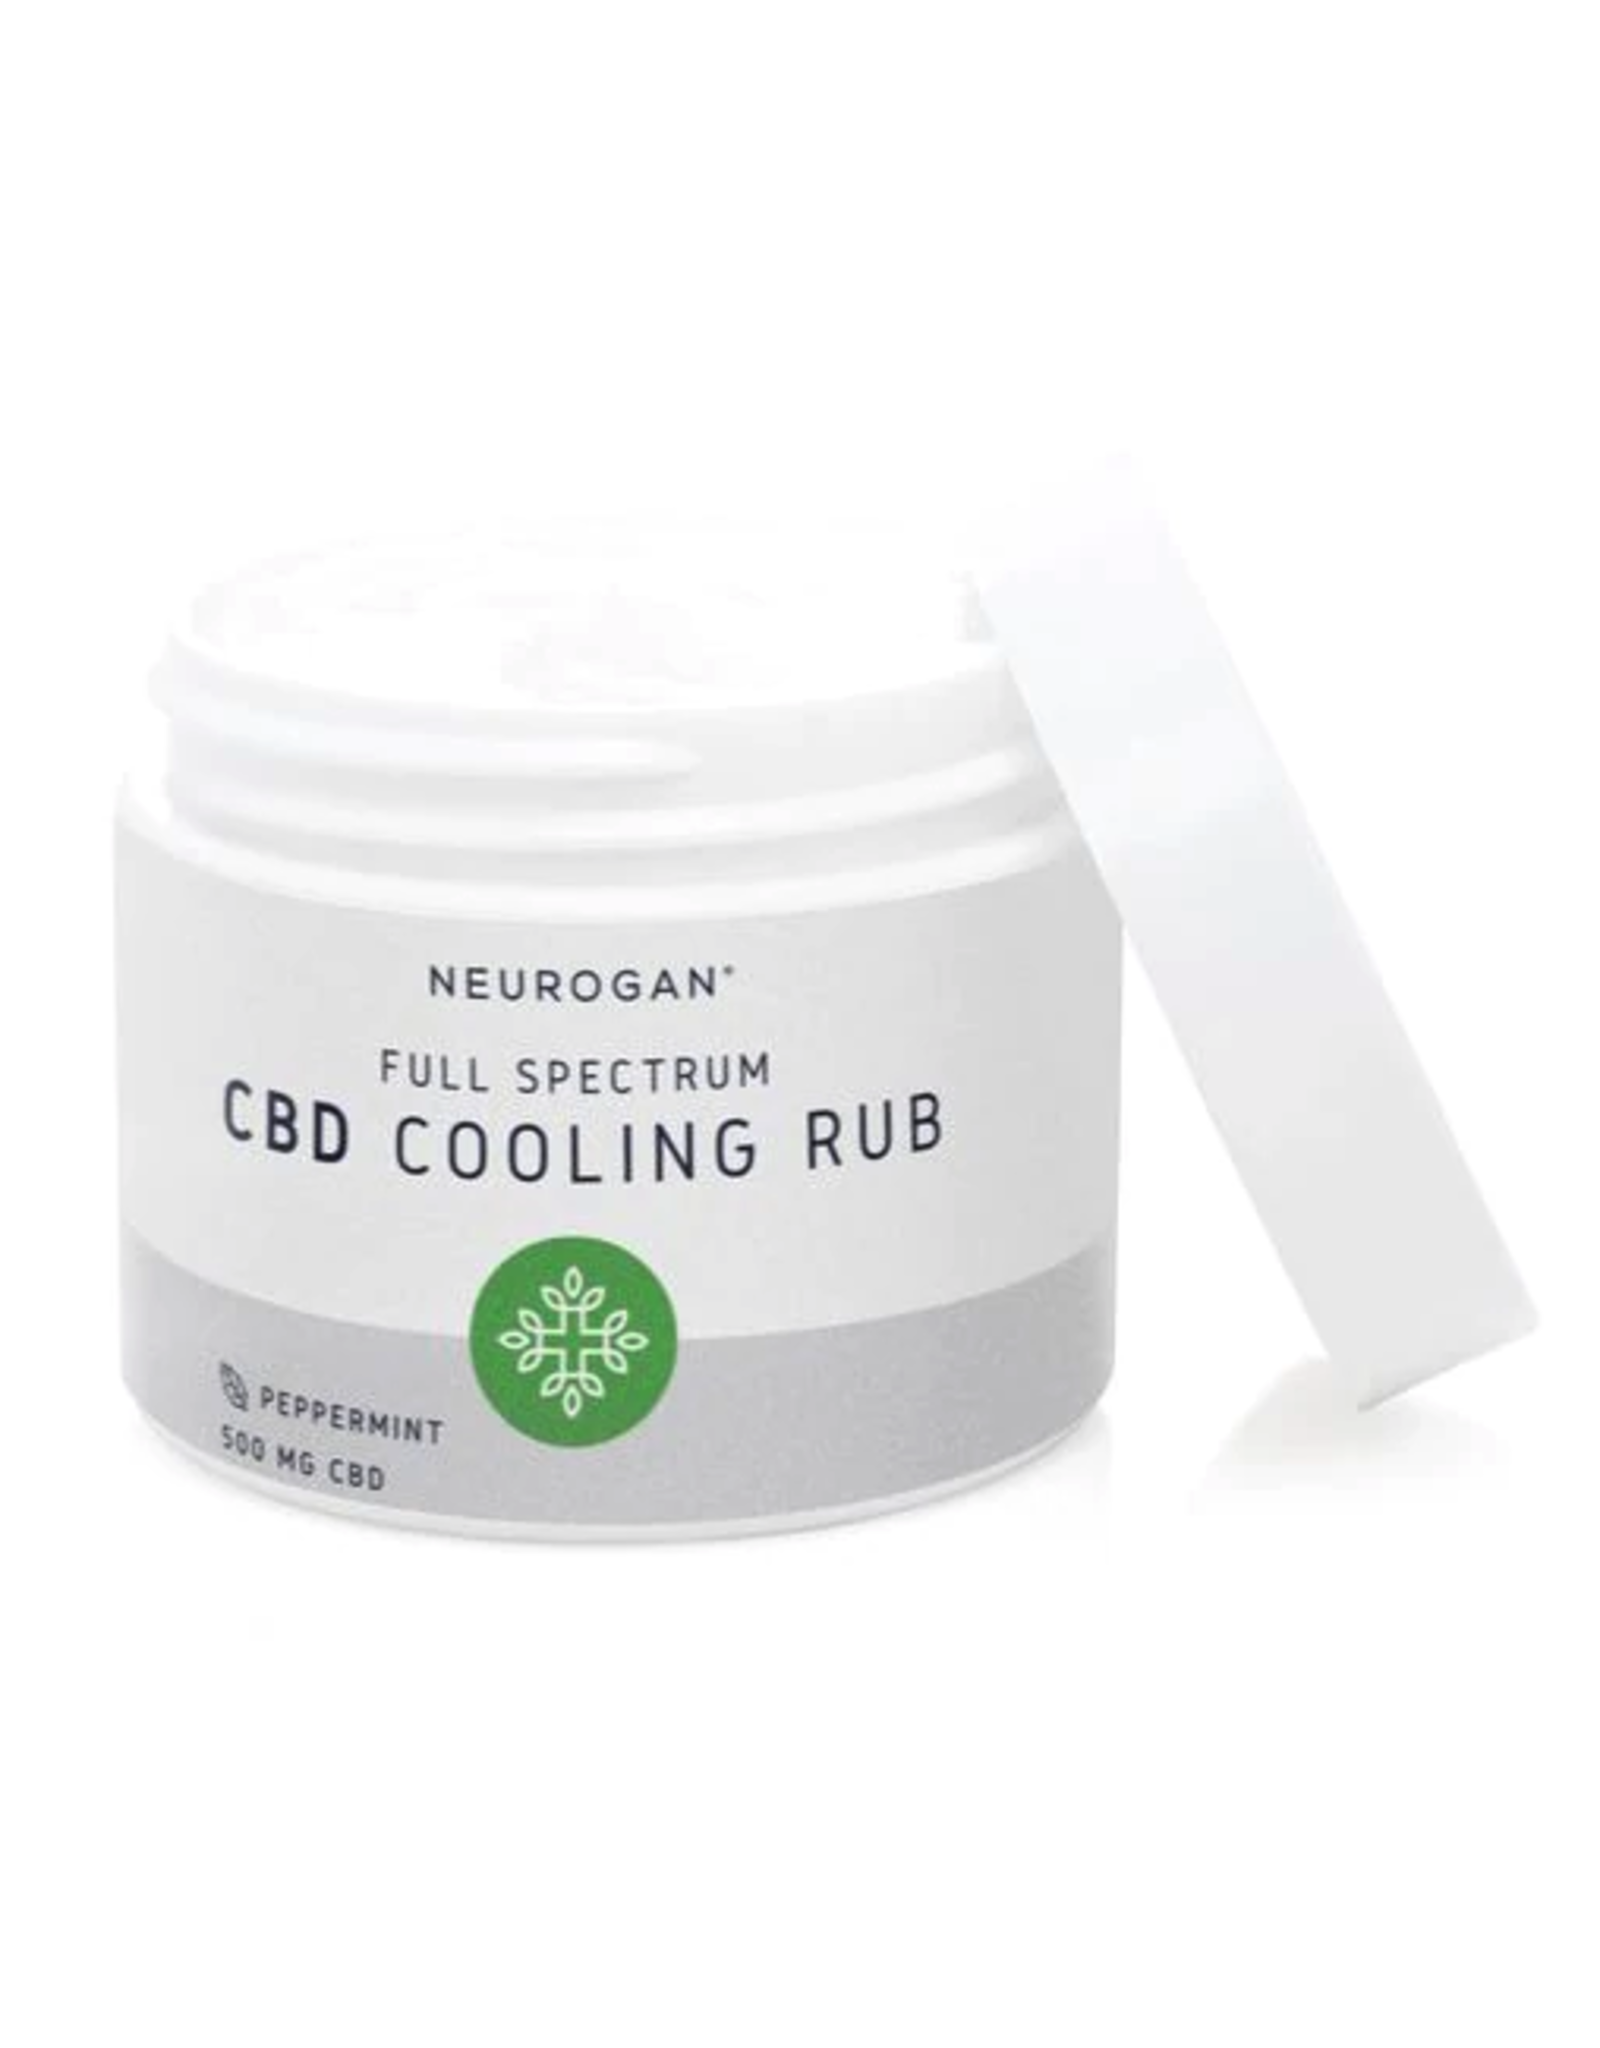 Neurogan Neurogan Full Spectrum CBD Cooling Rub 500mg 2oz